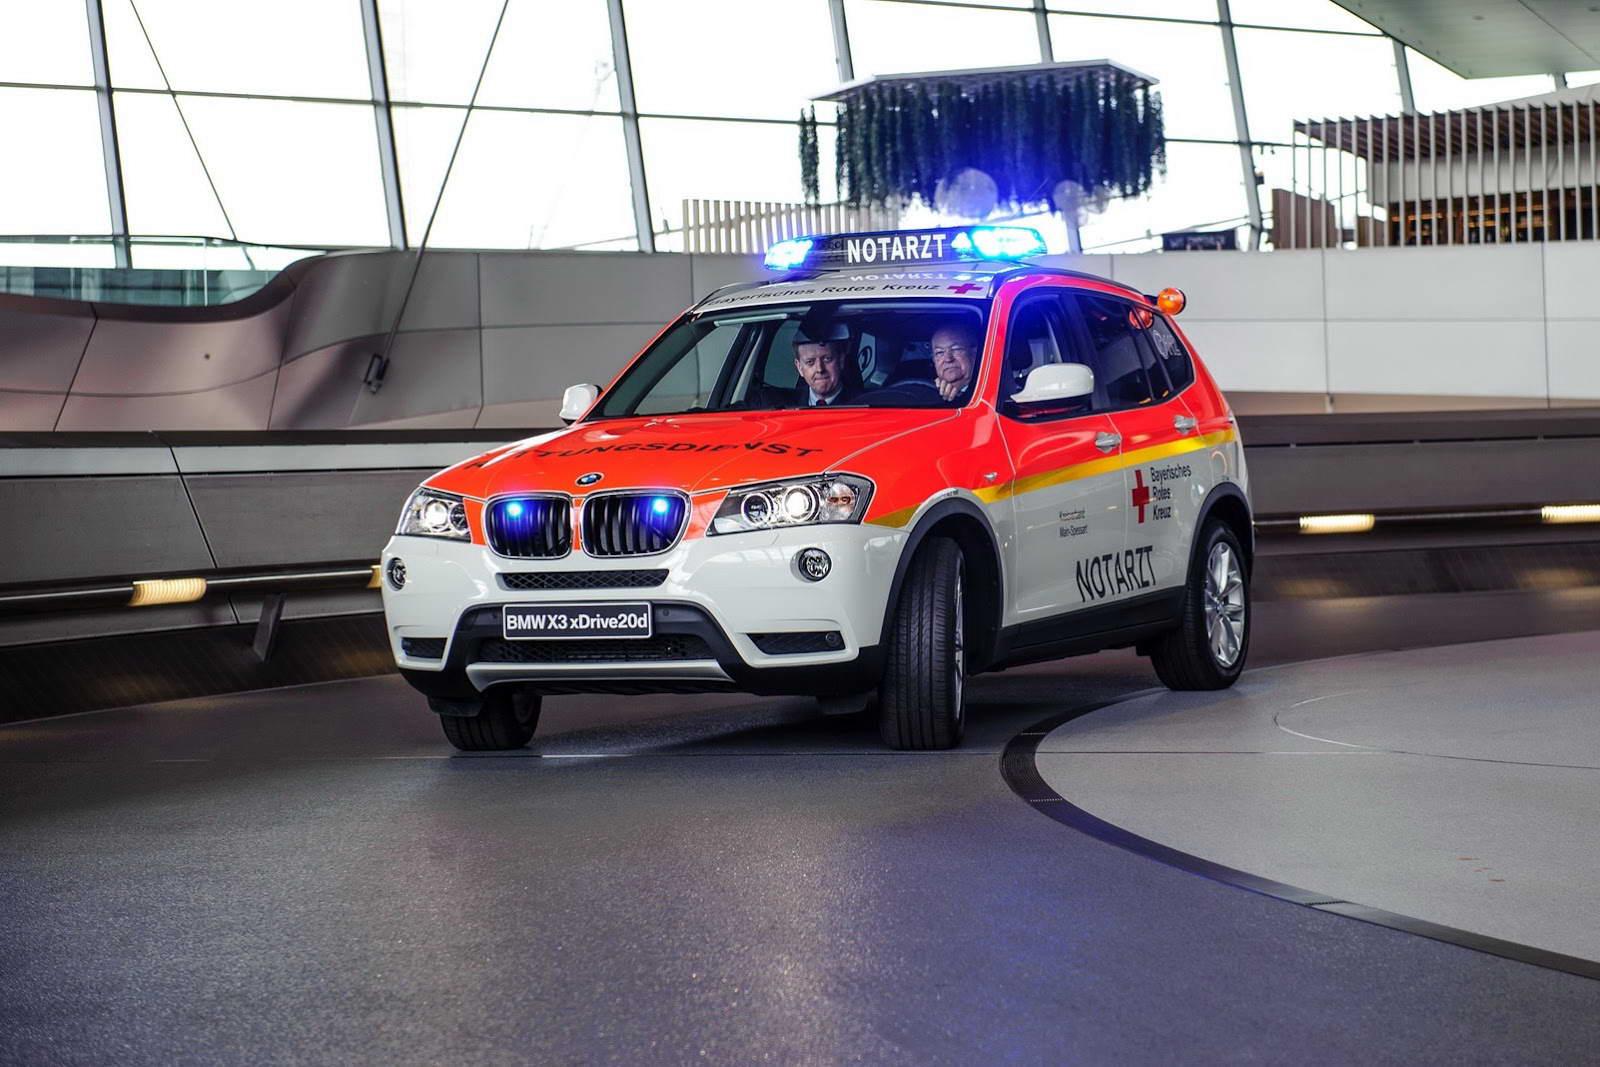 BMW X3 Red Cross